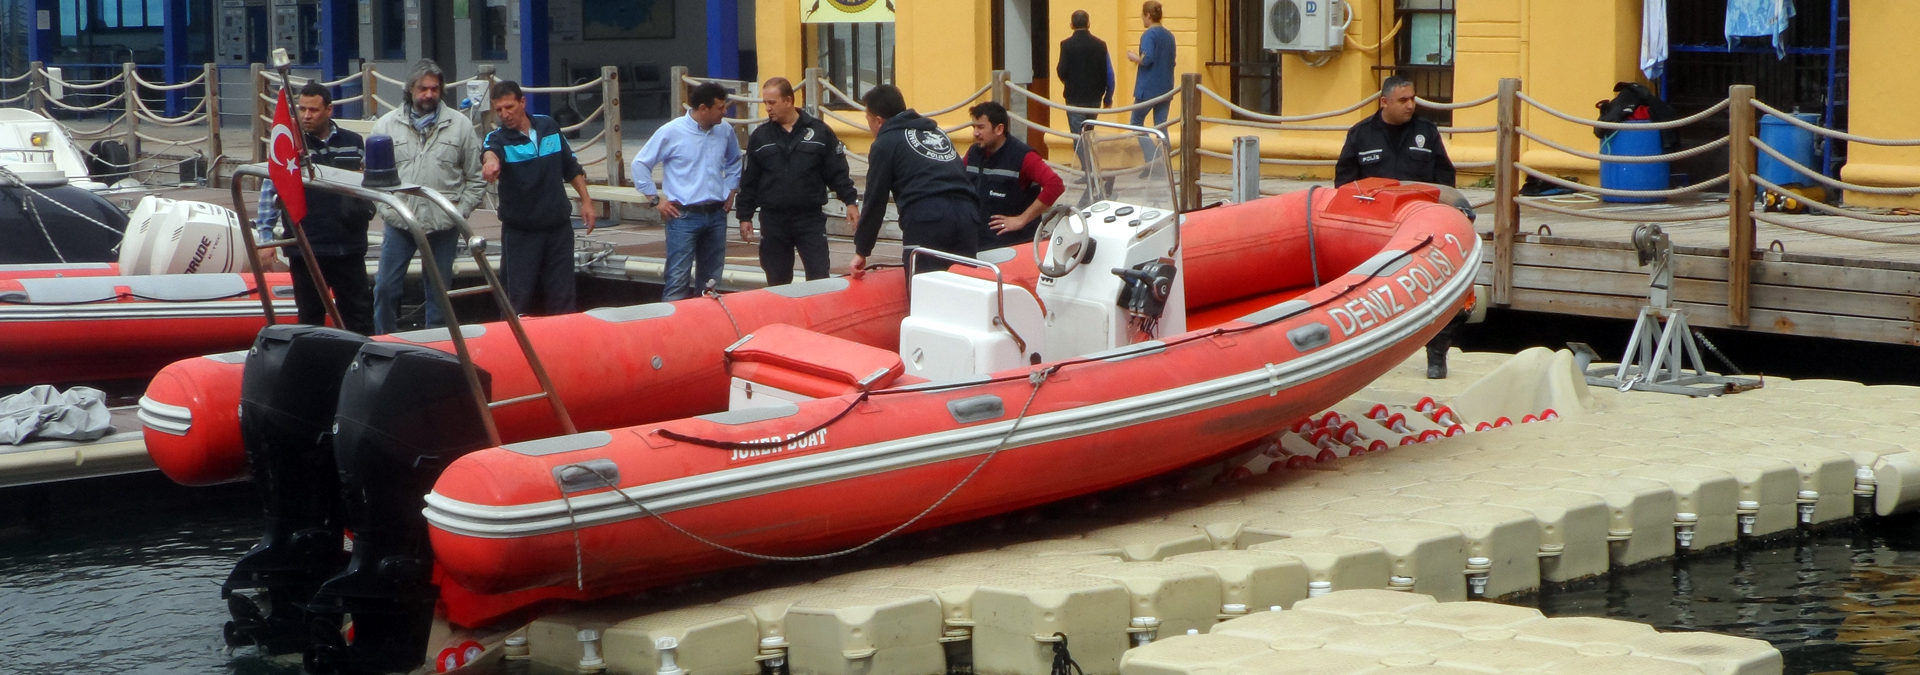 boatlift-tekne-platformu-5